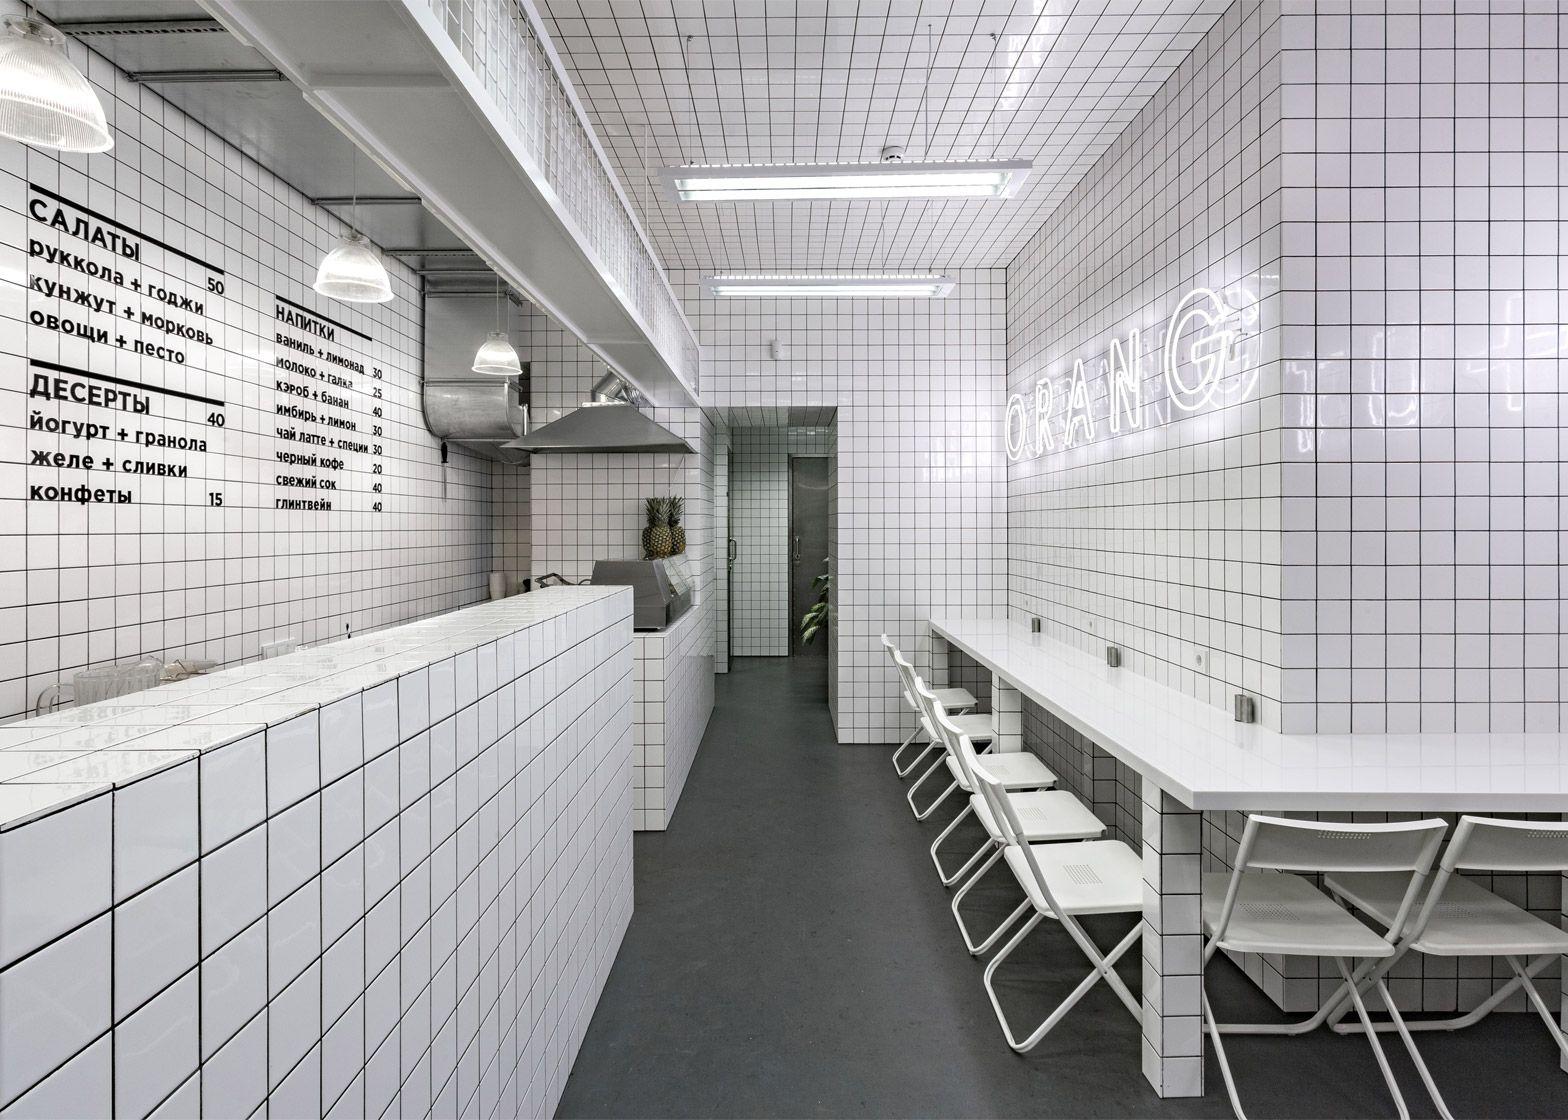 Orang utan veggie cafe has white tiling and neon signage ○ re